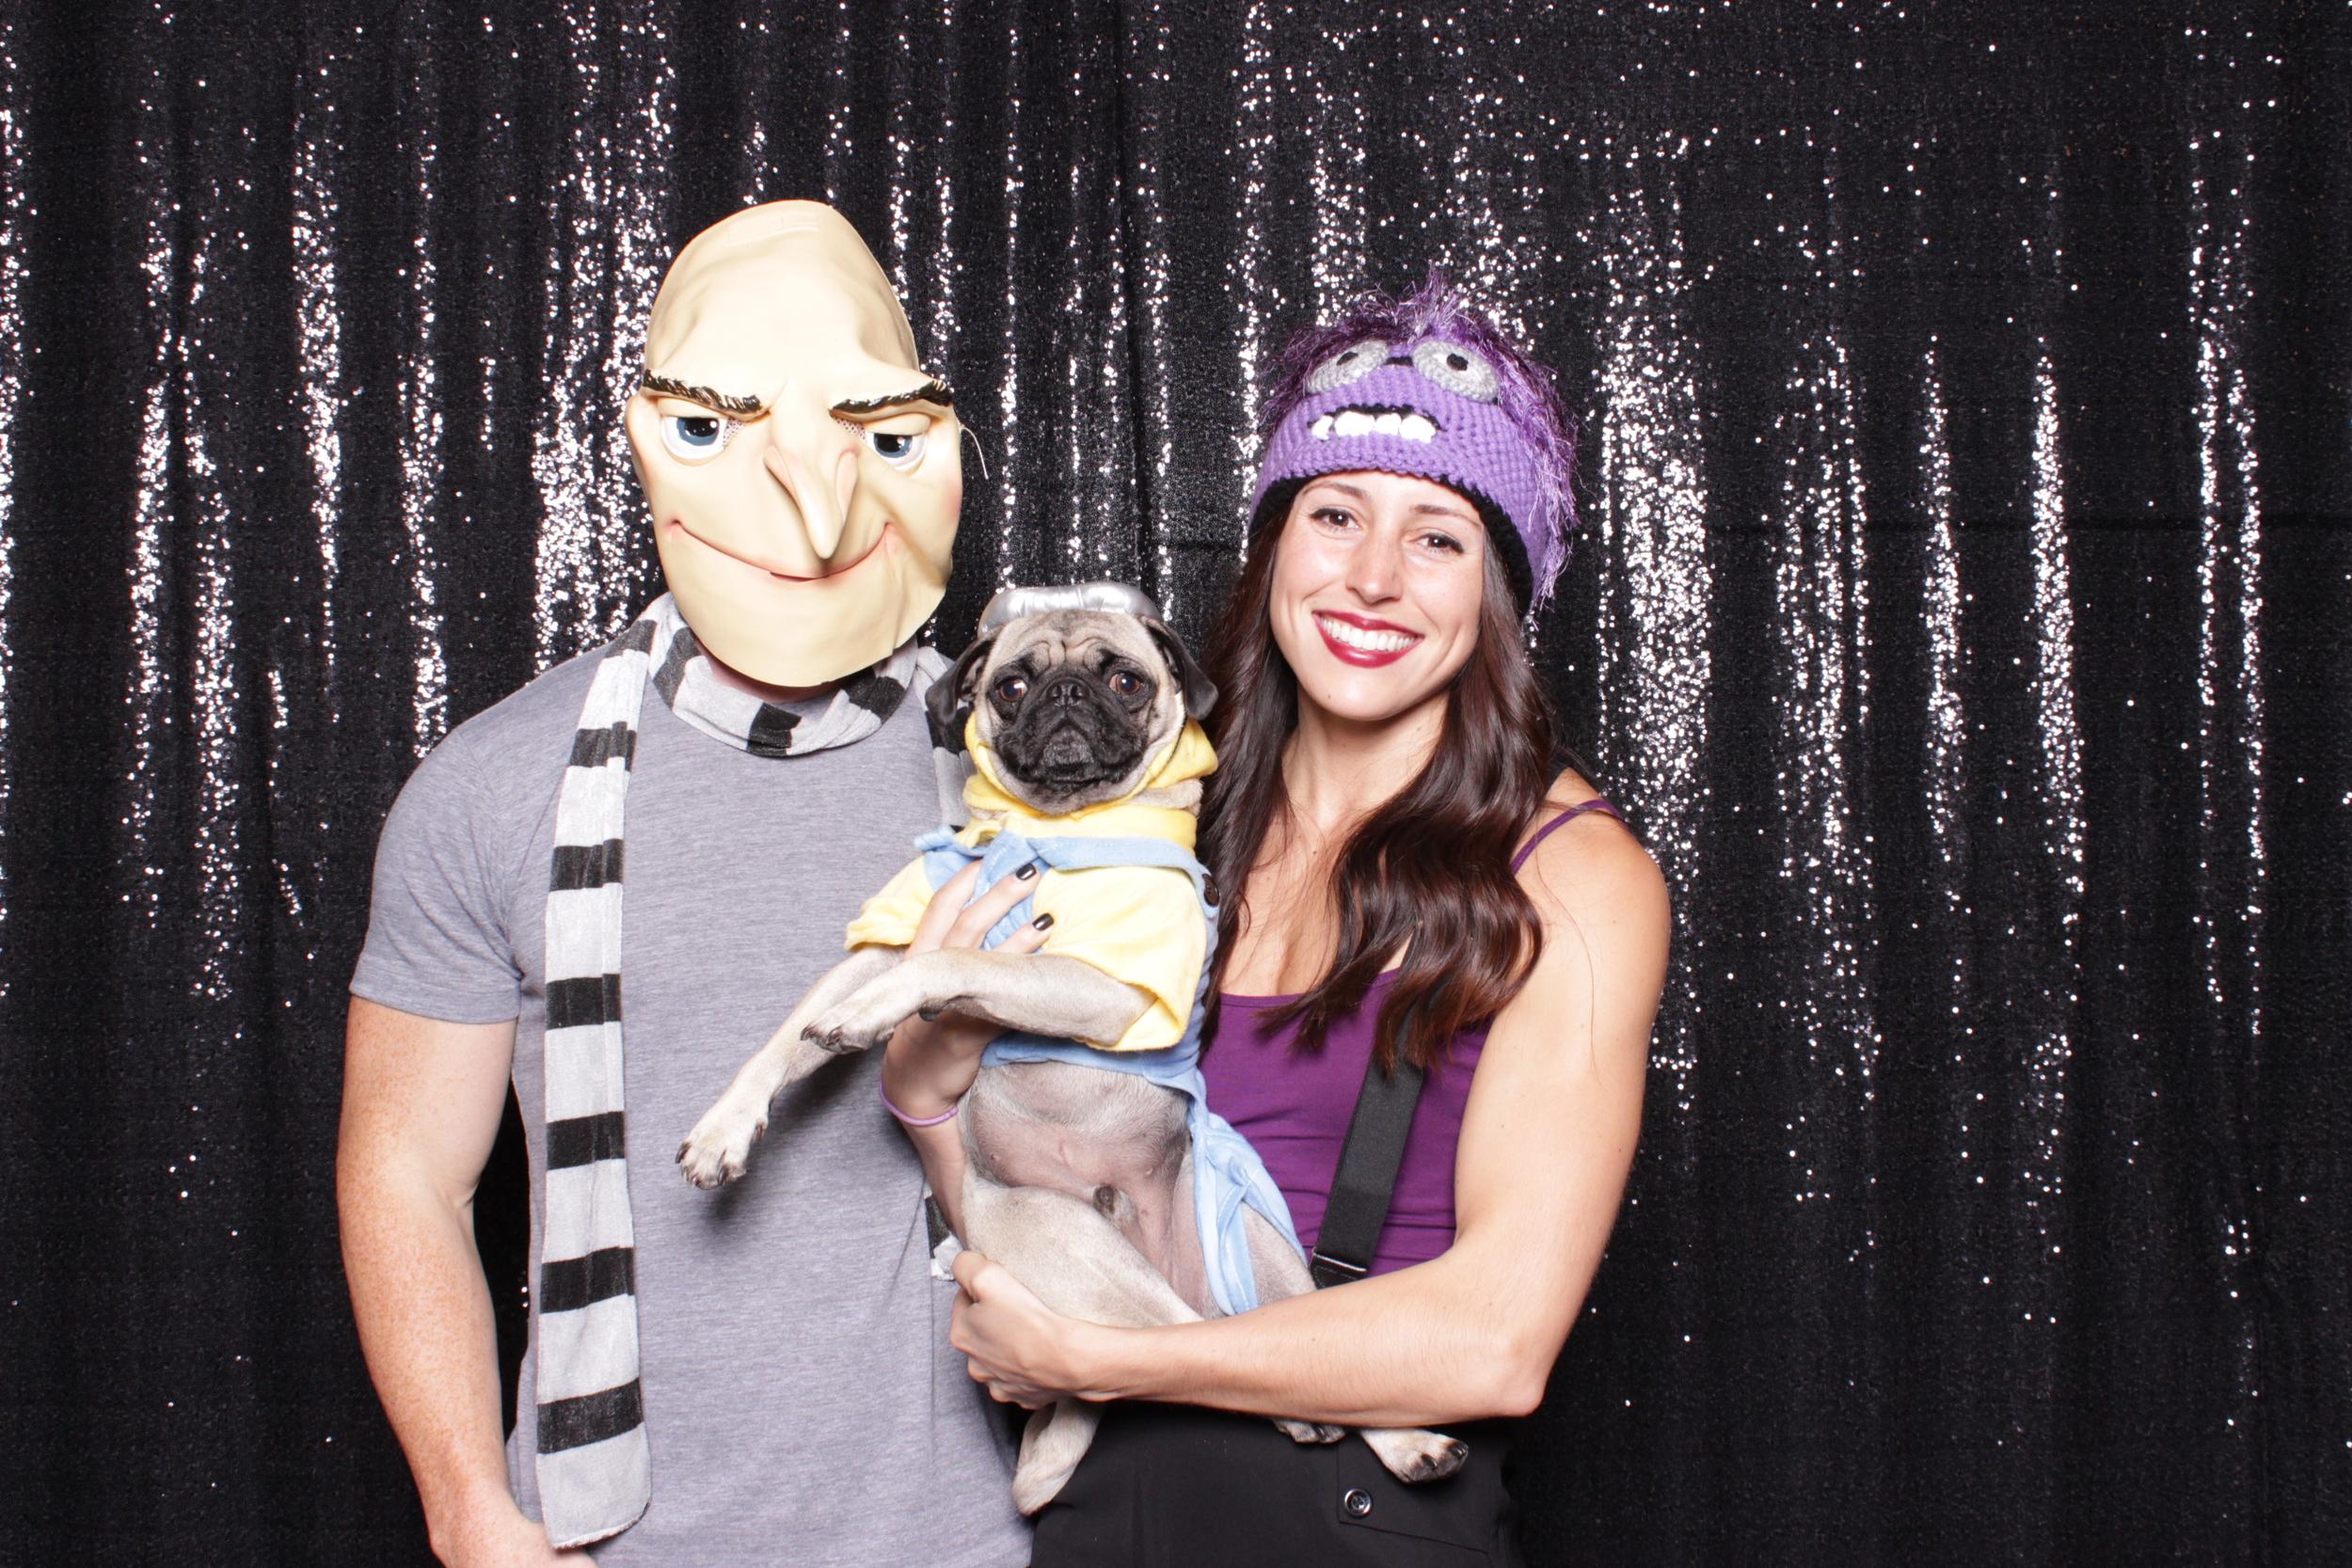 Love this costume combo, gotta love the pug!